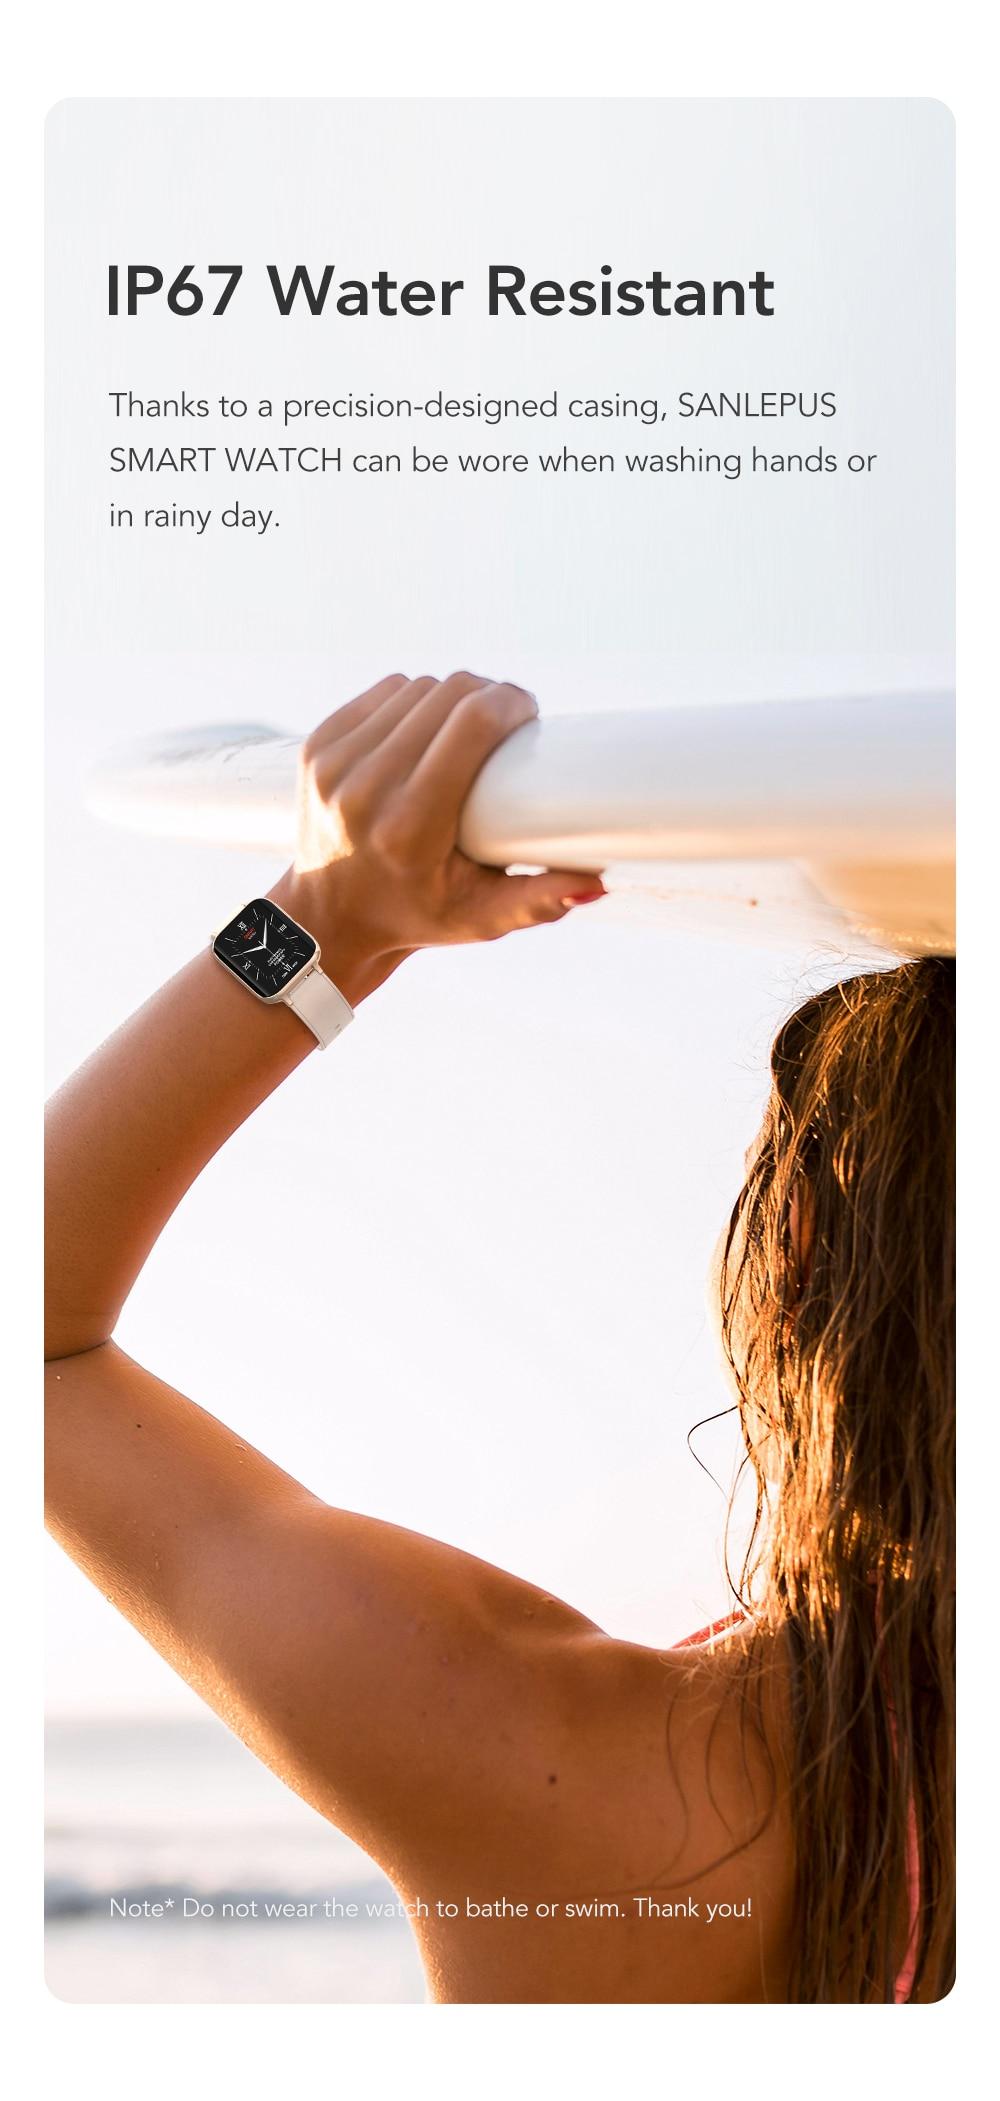 H919459d39bdd4ca0a84cfc48956dc85aI SANLEPUS 2021 NEW Dial Calls Smart Watch Men Women Waterproof Smartwatch MP3 Player For OPPO Android Apple Xiaomi Huawei